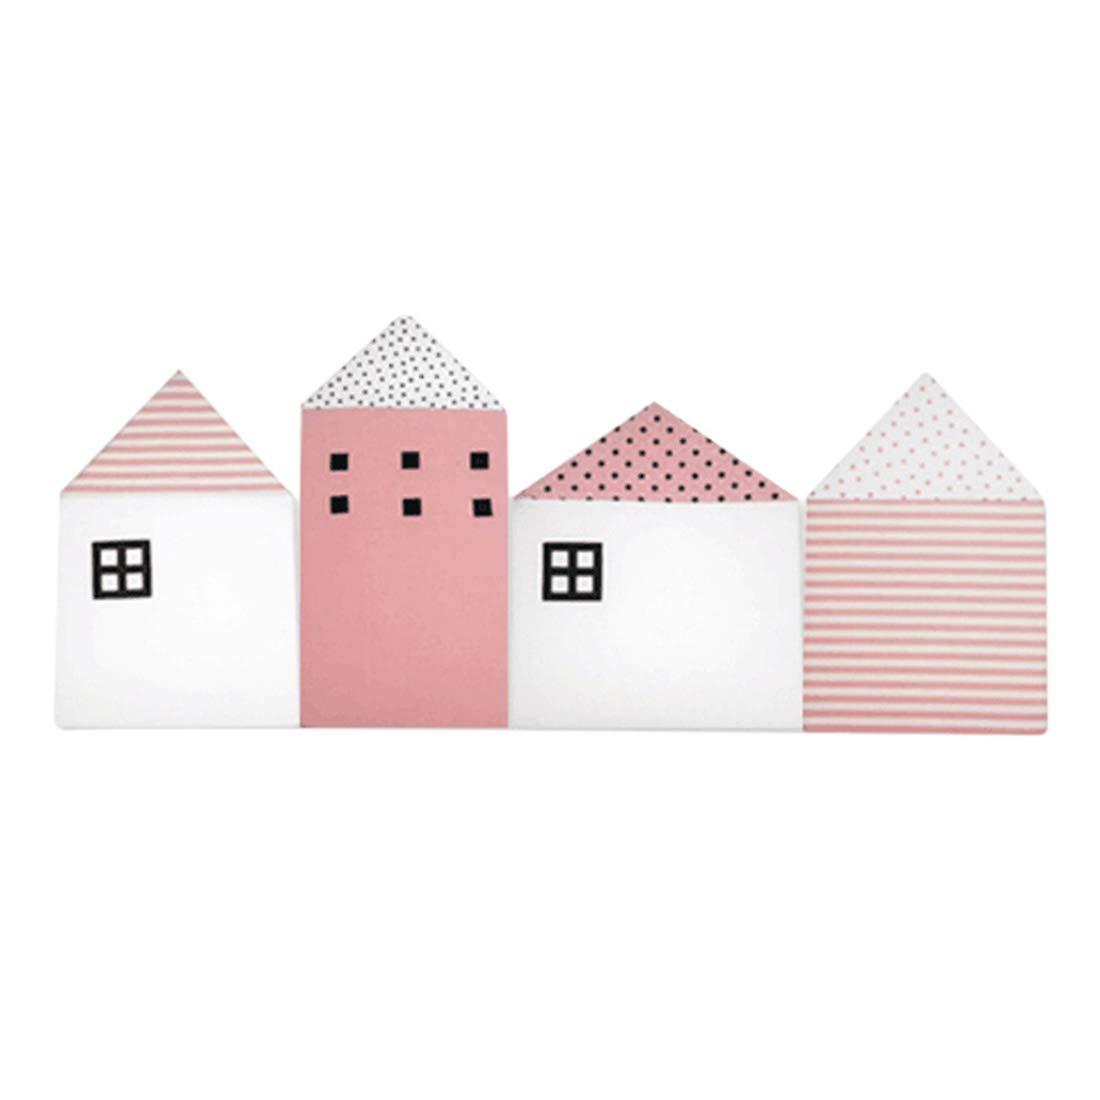 Jiyaru 4 Pieces Baby Crib Bumper Cotton Nursery Cradle Pads House Shape Pink Jiyarue